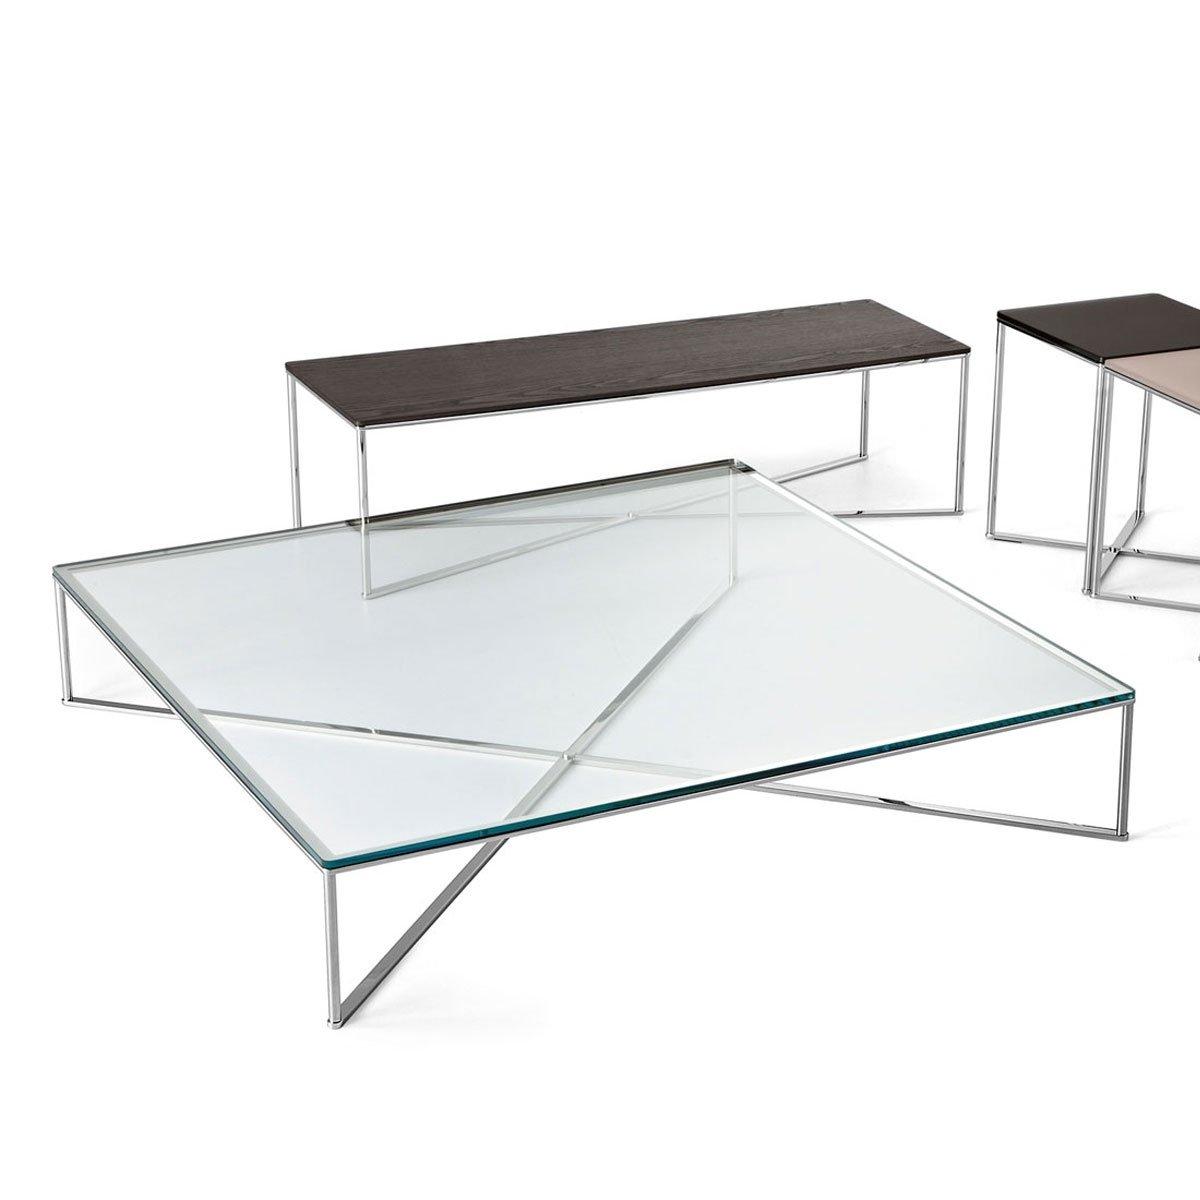 Maxim Glass and metal Coffee Table by Gallotti & Radice